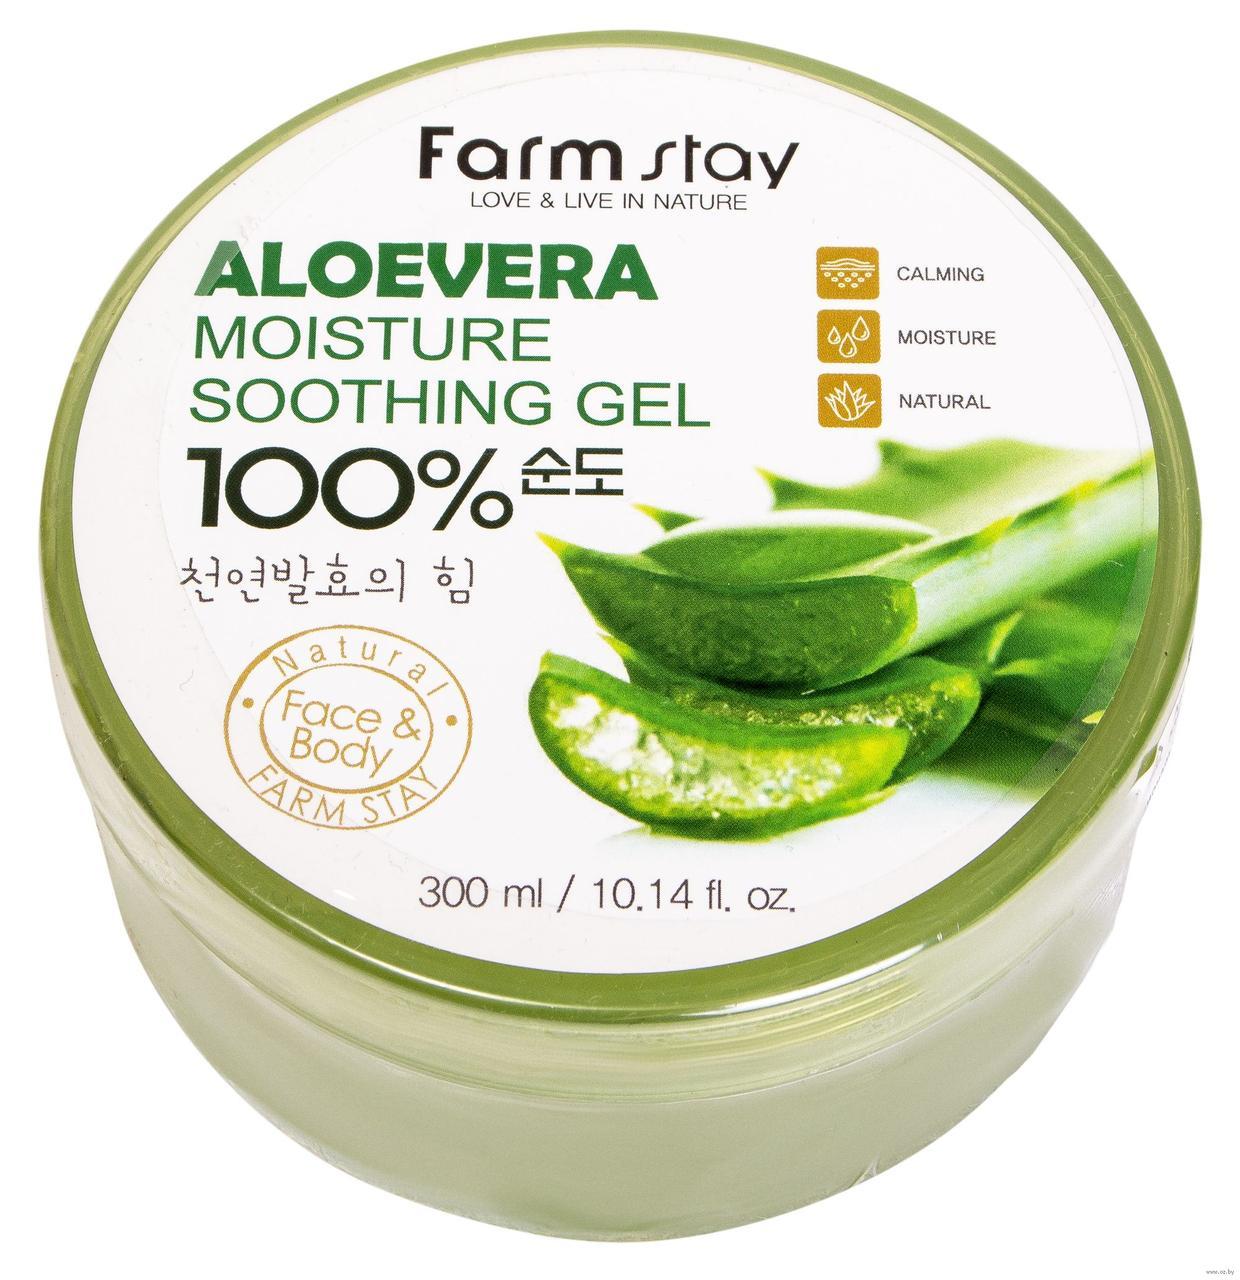 Гель для лица и тела Farm Stay Aloe Vera Moisture Soothing Gel 300 ml.